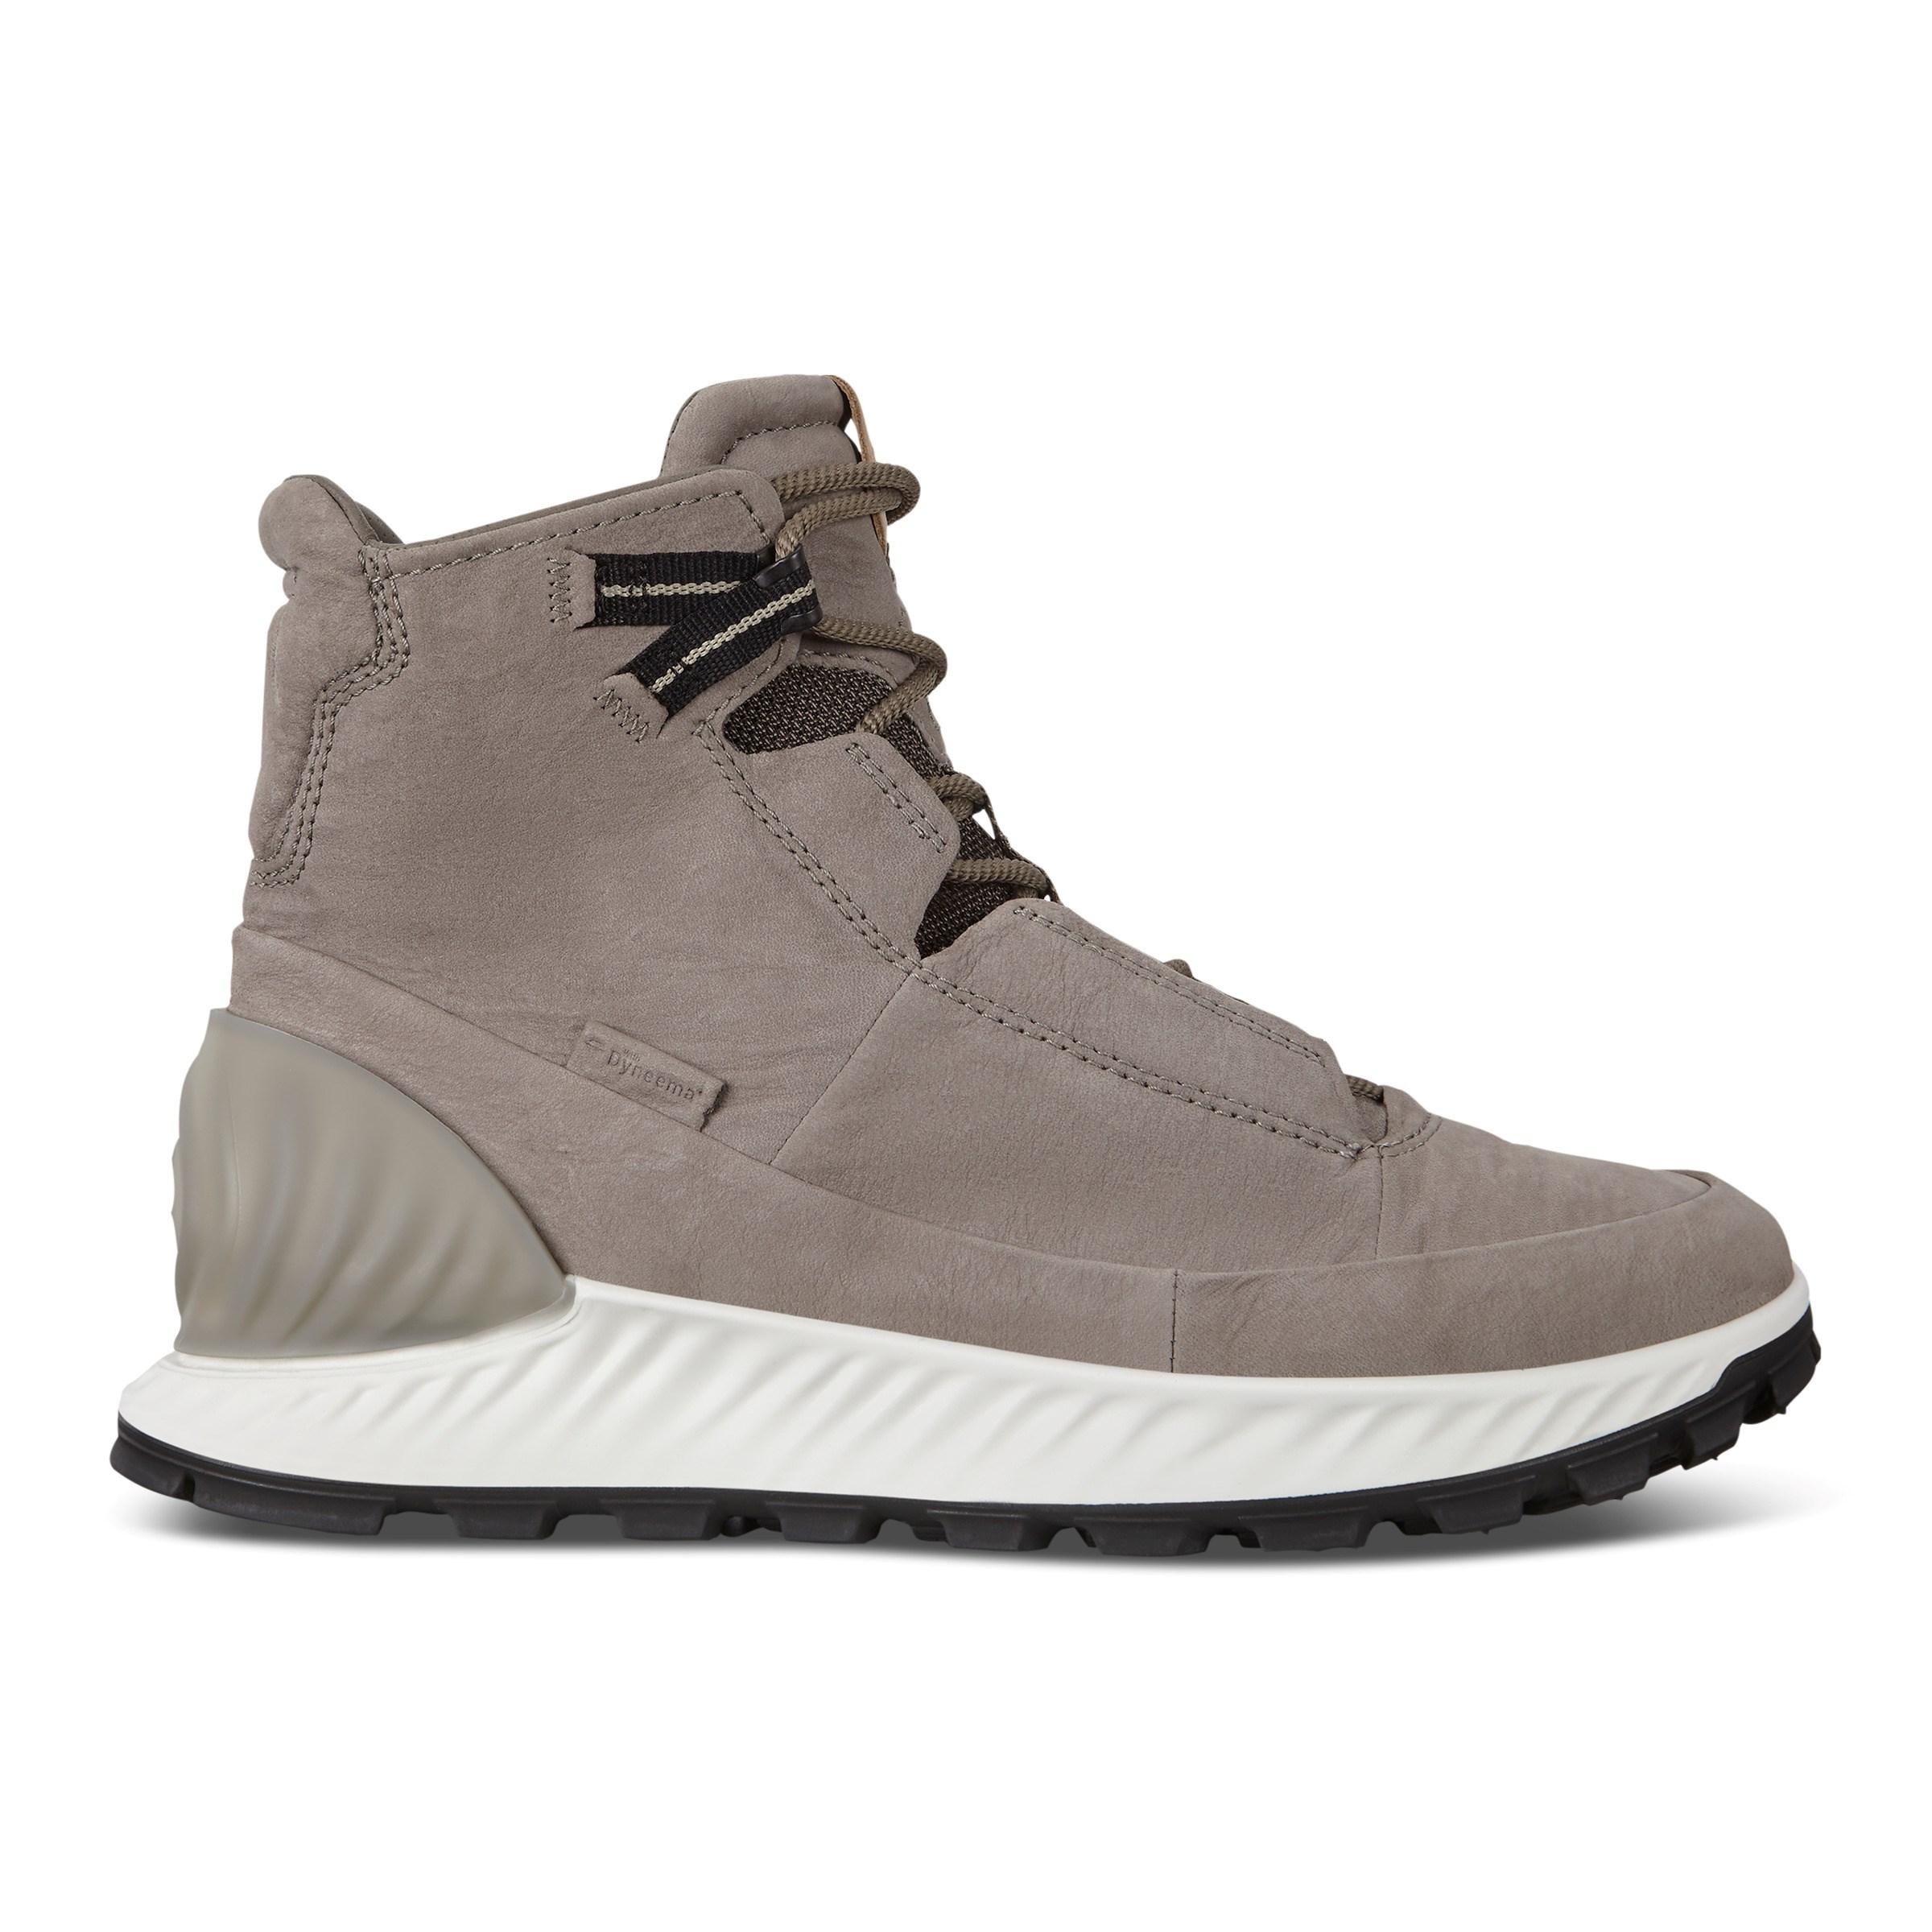 Details zu Ecco Exostrike Bowmar HM Schuhe Men Herren High Top Sneaker Hiking Boots 832304